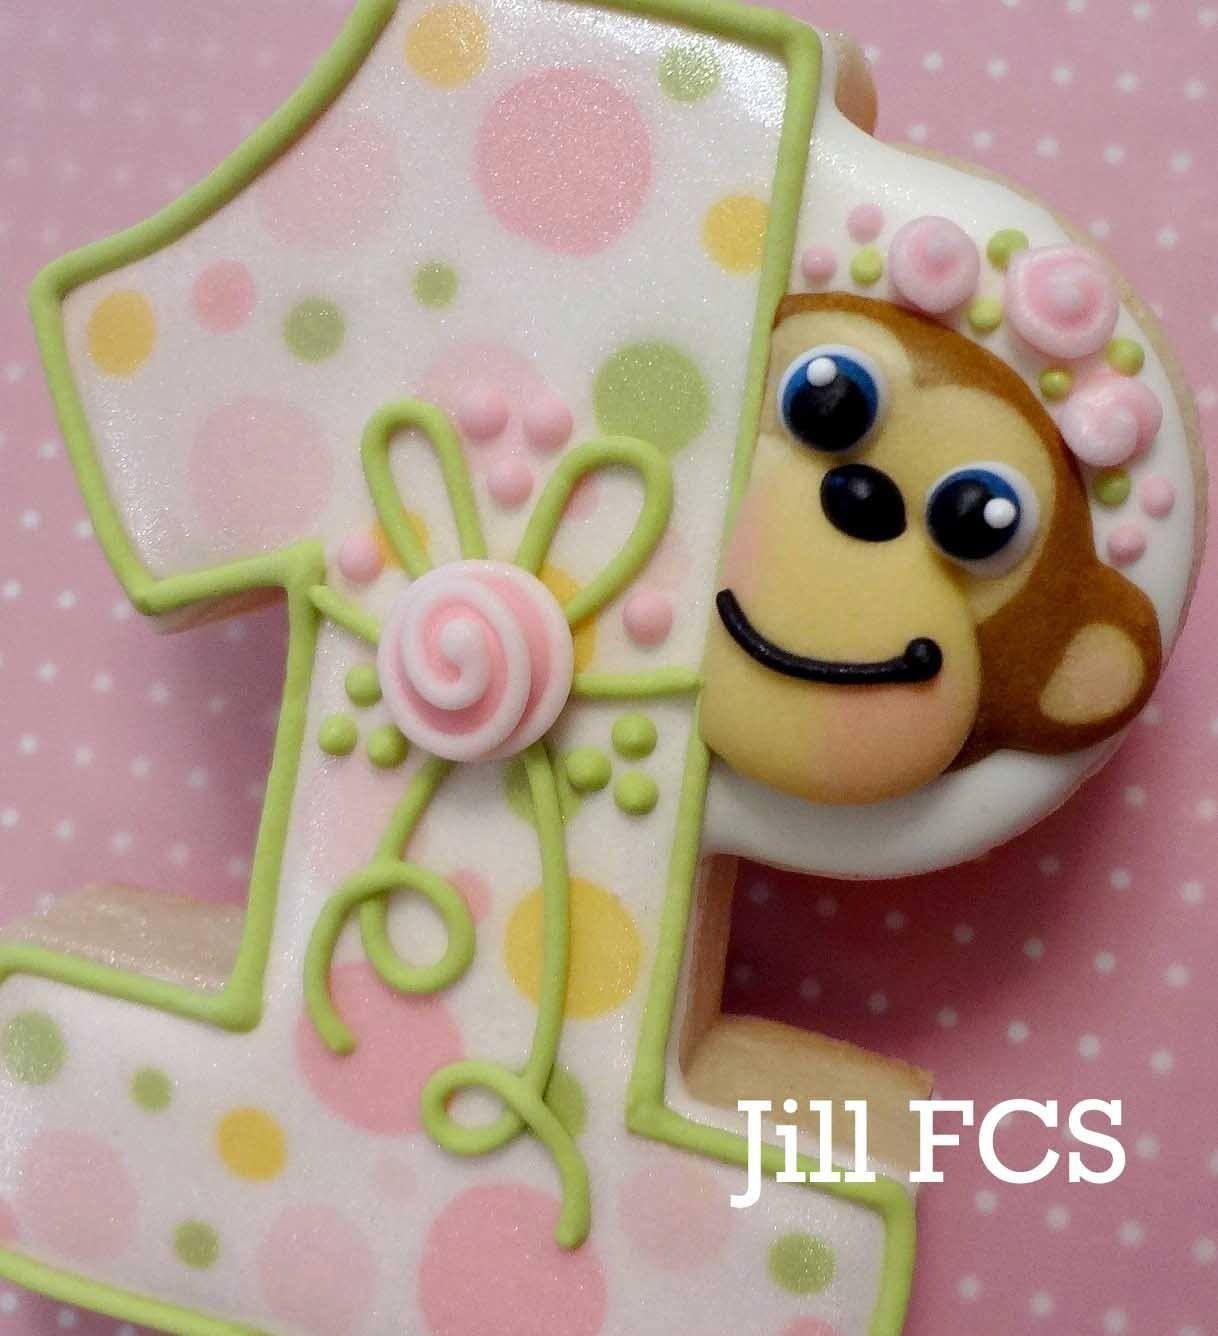 Birthday cookie by Jill FCS